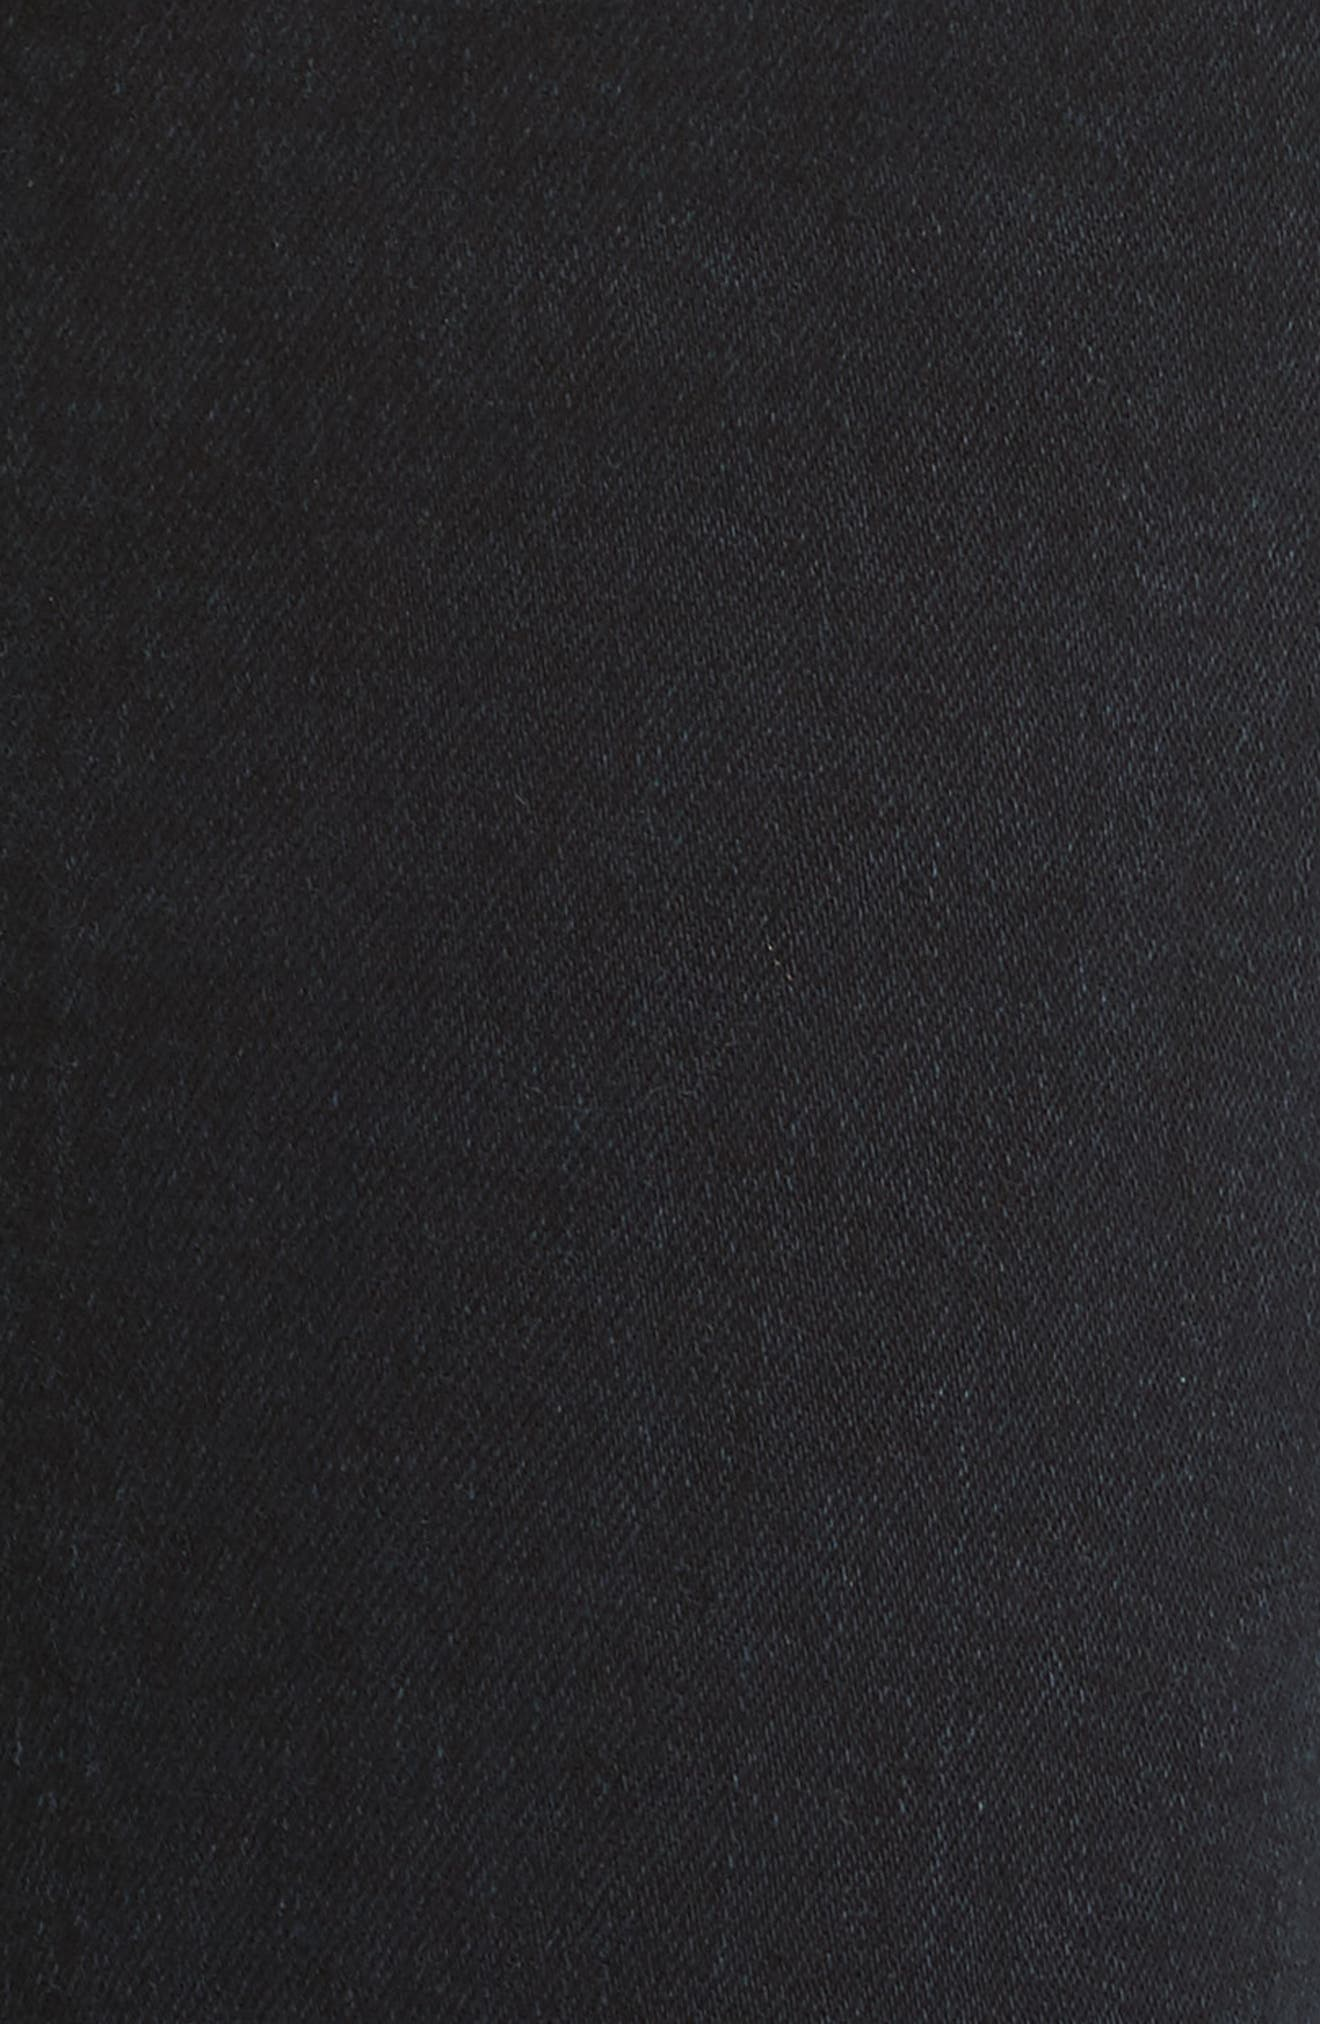 PSWL Crop Kick Flare Jeans,                             Alternate thumbnail 7, color,                             Stone Washed Black